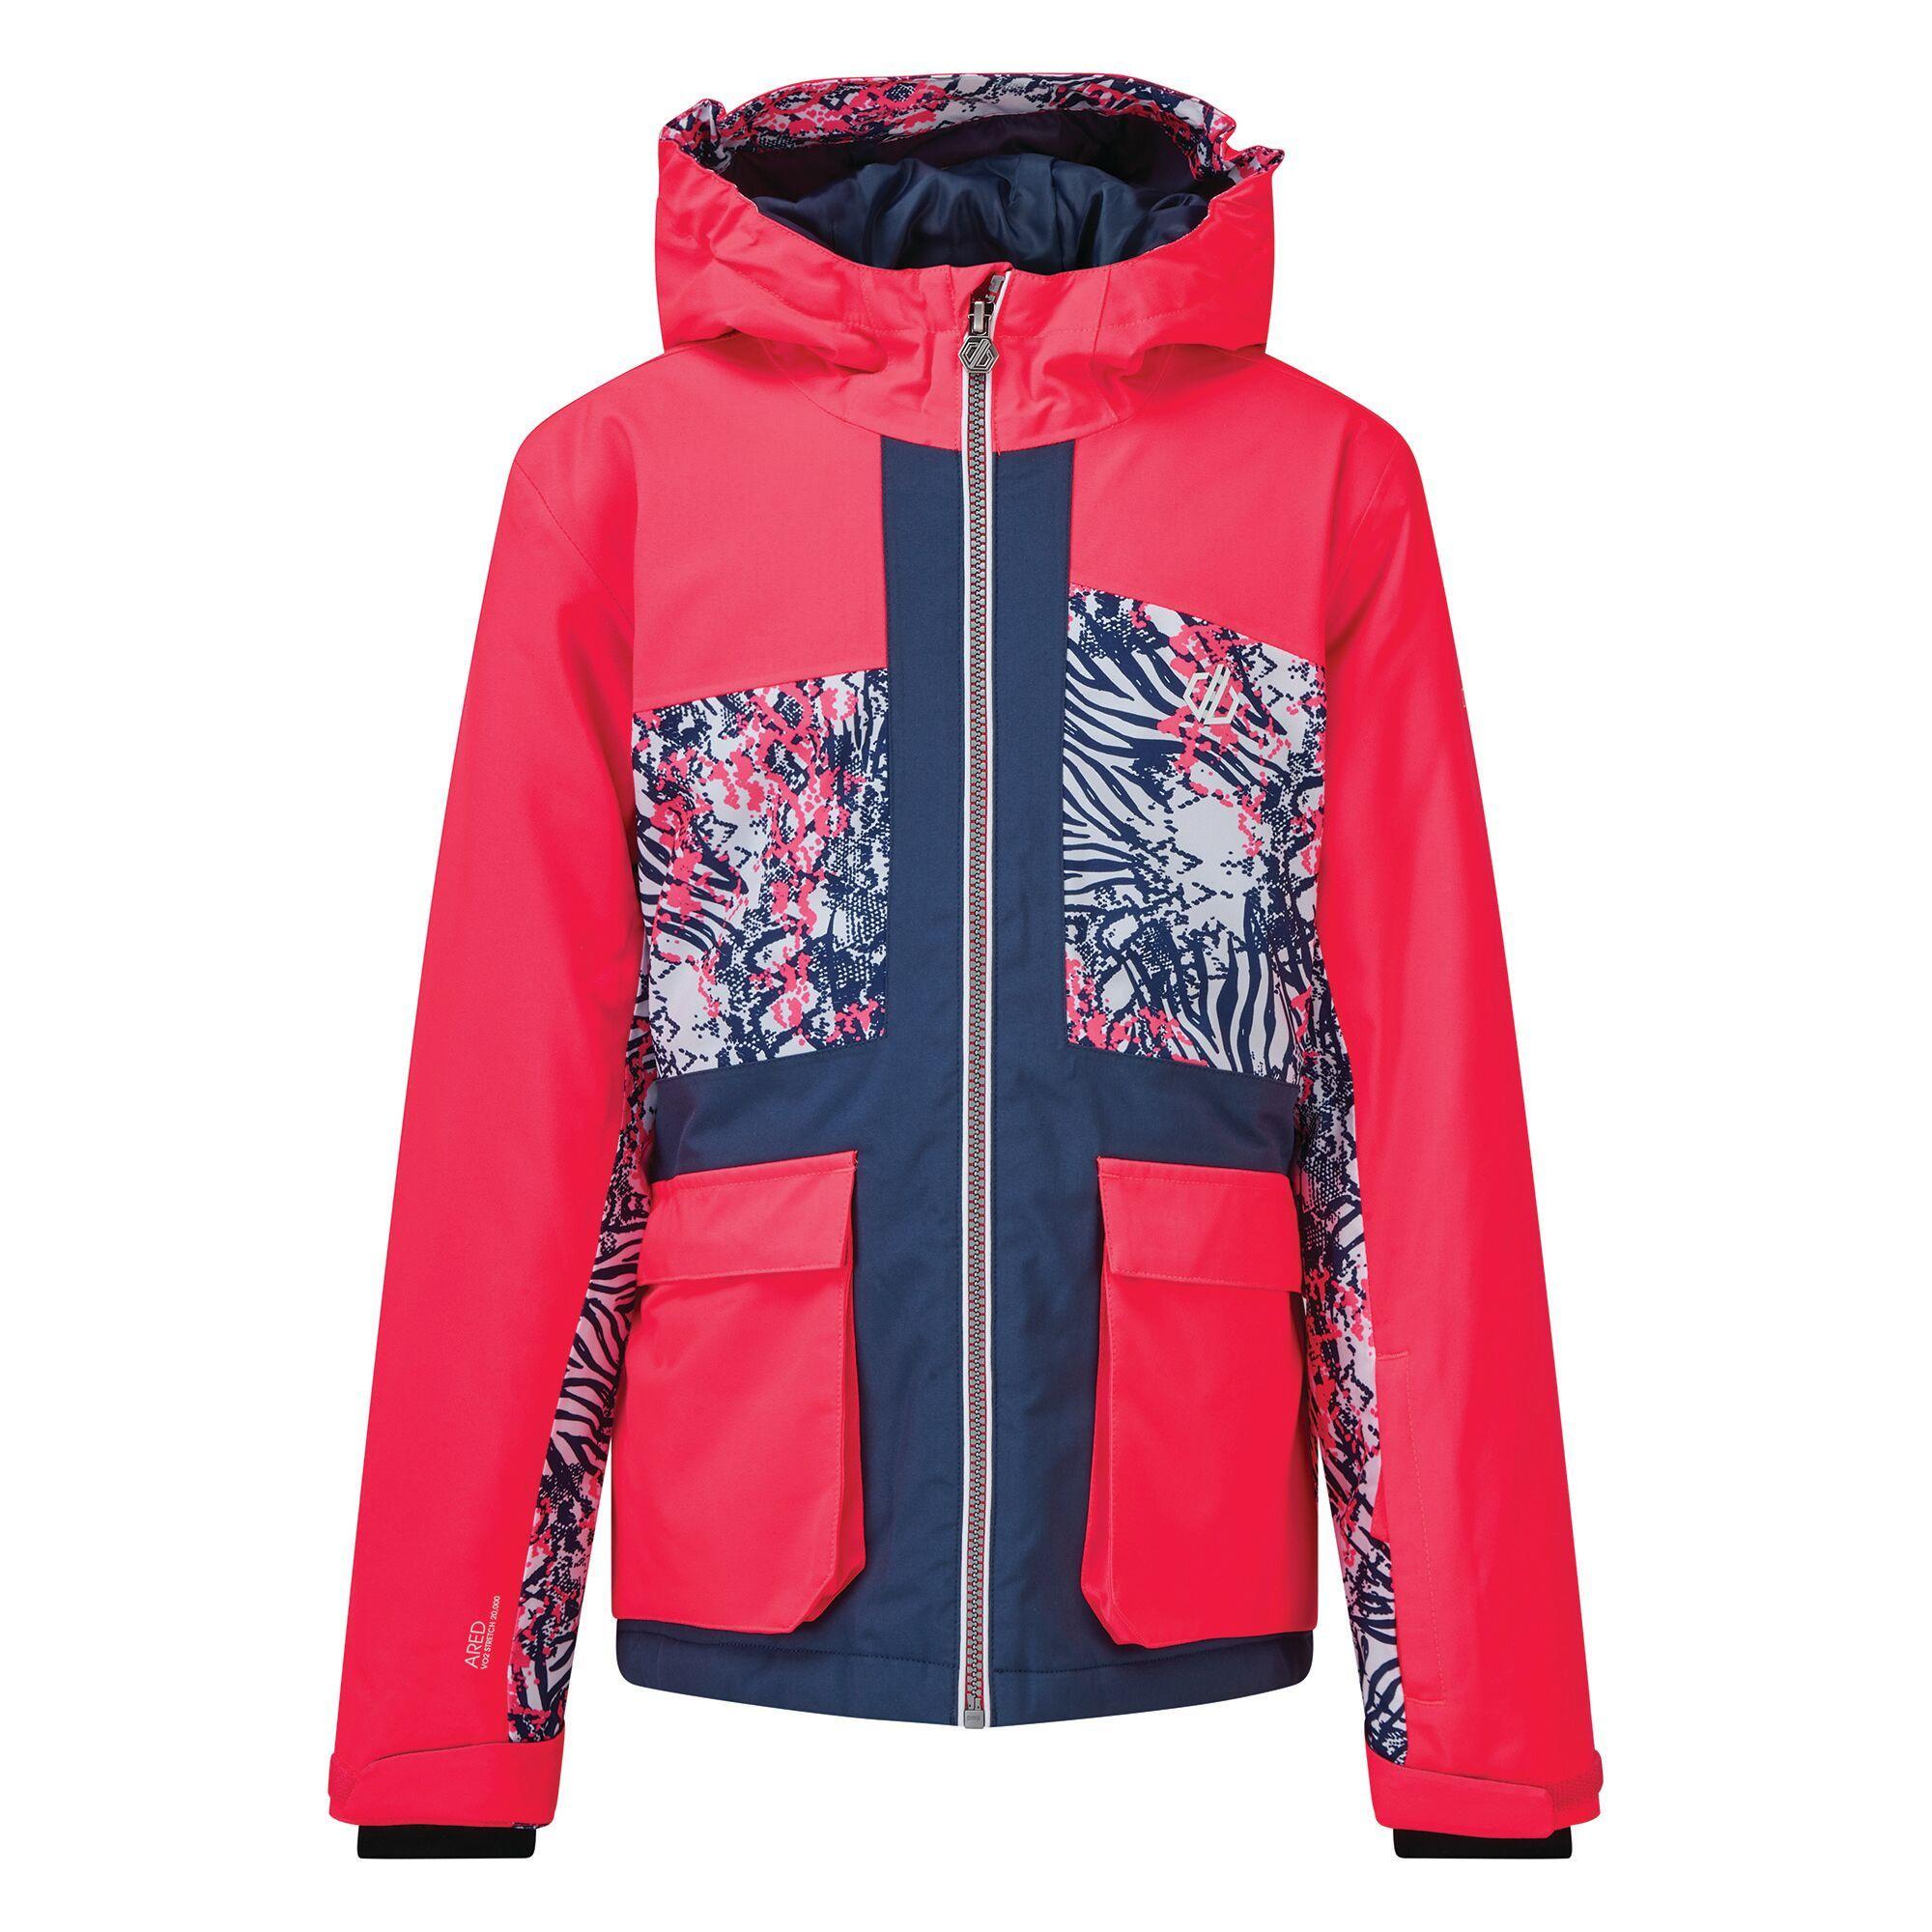 Dare 2B Childrens/Kids Esteem Insulated Ski Jacket (11-12 Years) (Neon Pink/Dark Denim)